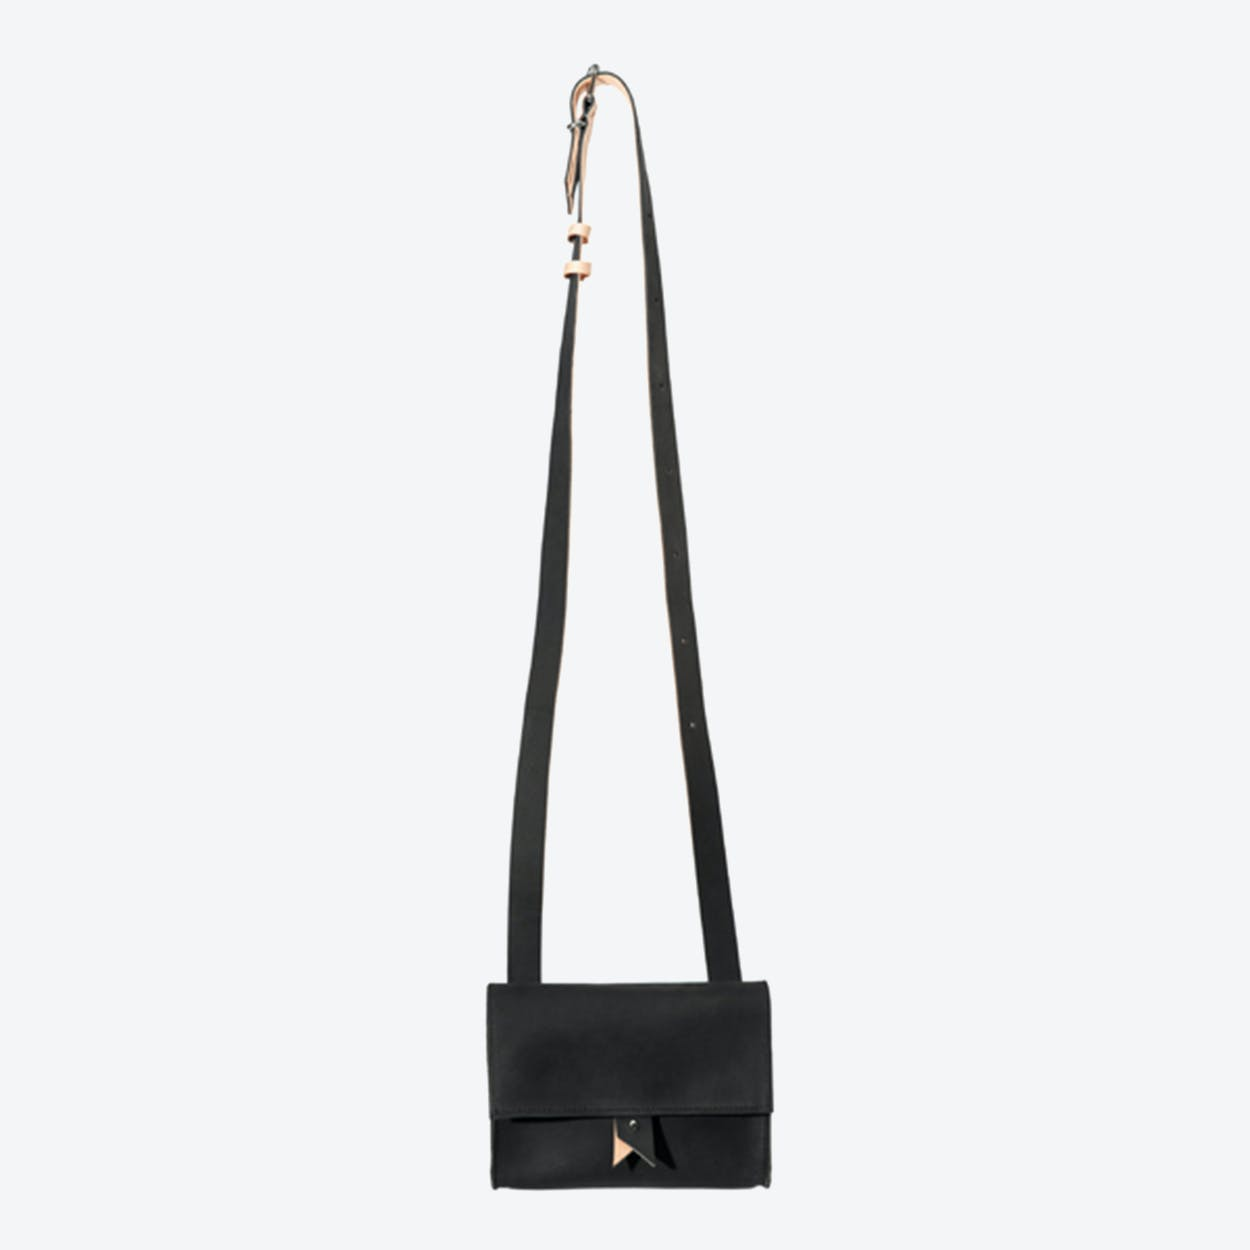 Beltpack - Black